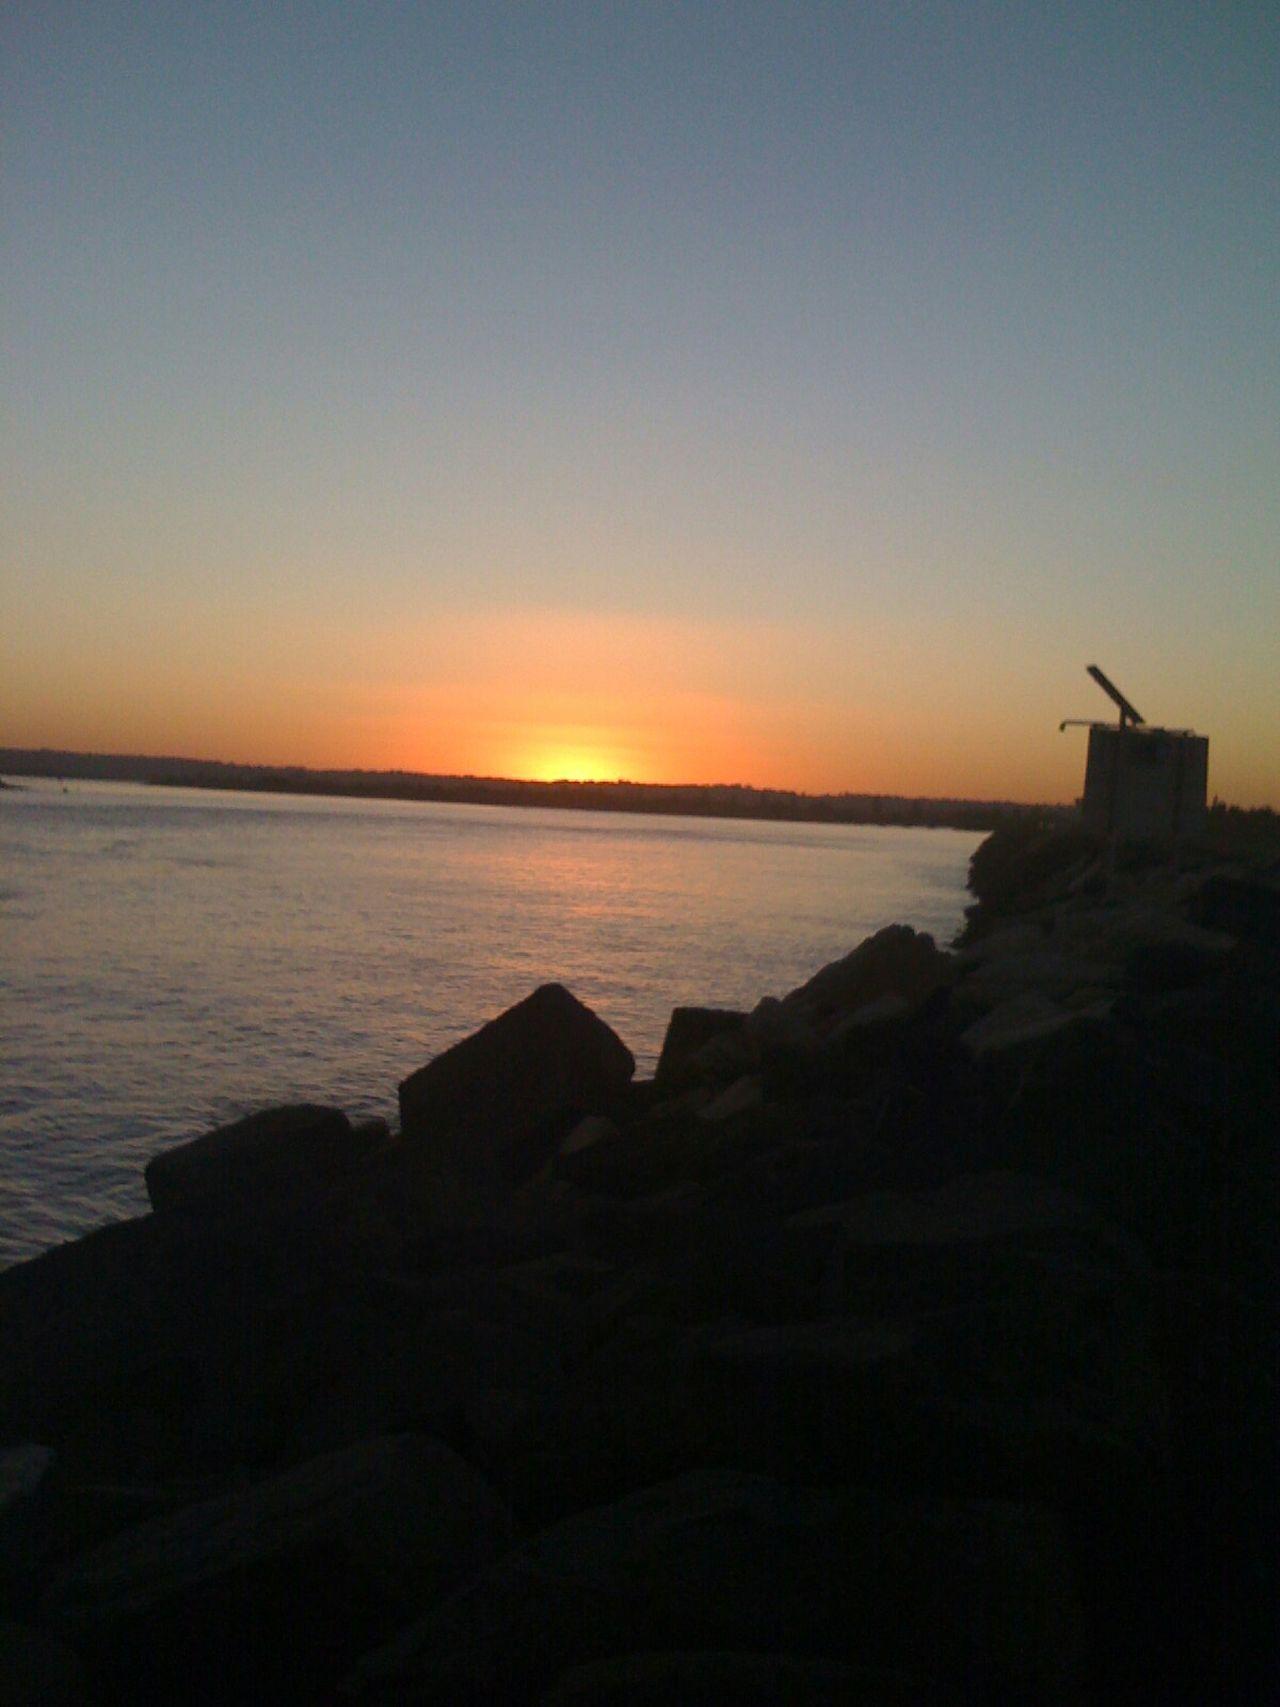 Sunset Sunset #sun #clouds #skylovers #sky #nature #beautifulinnature #naturalbeauty #photography #landscape